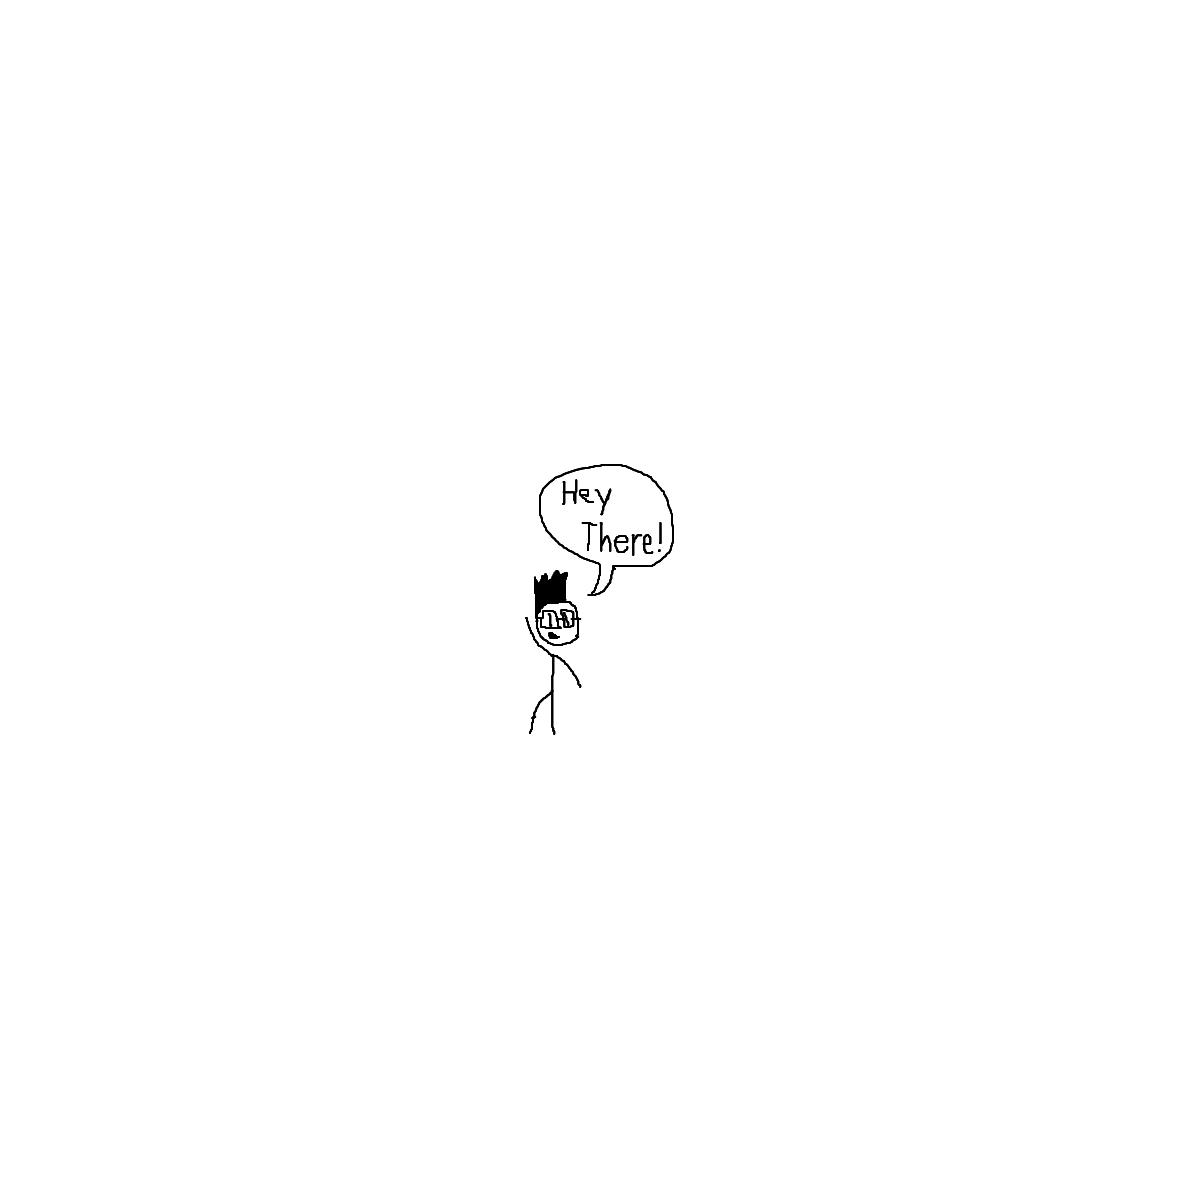 BAAAM drawing#23149 lat:53.6358642578125000lng: -113.6350402832031200